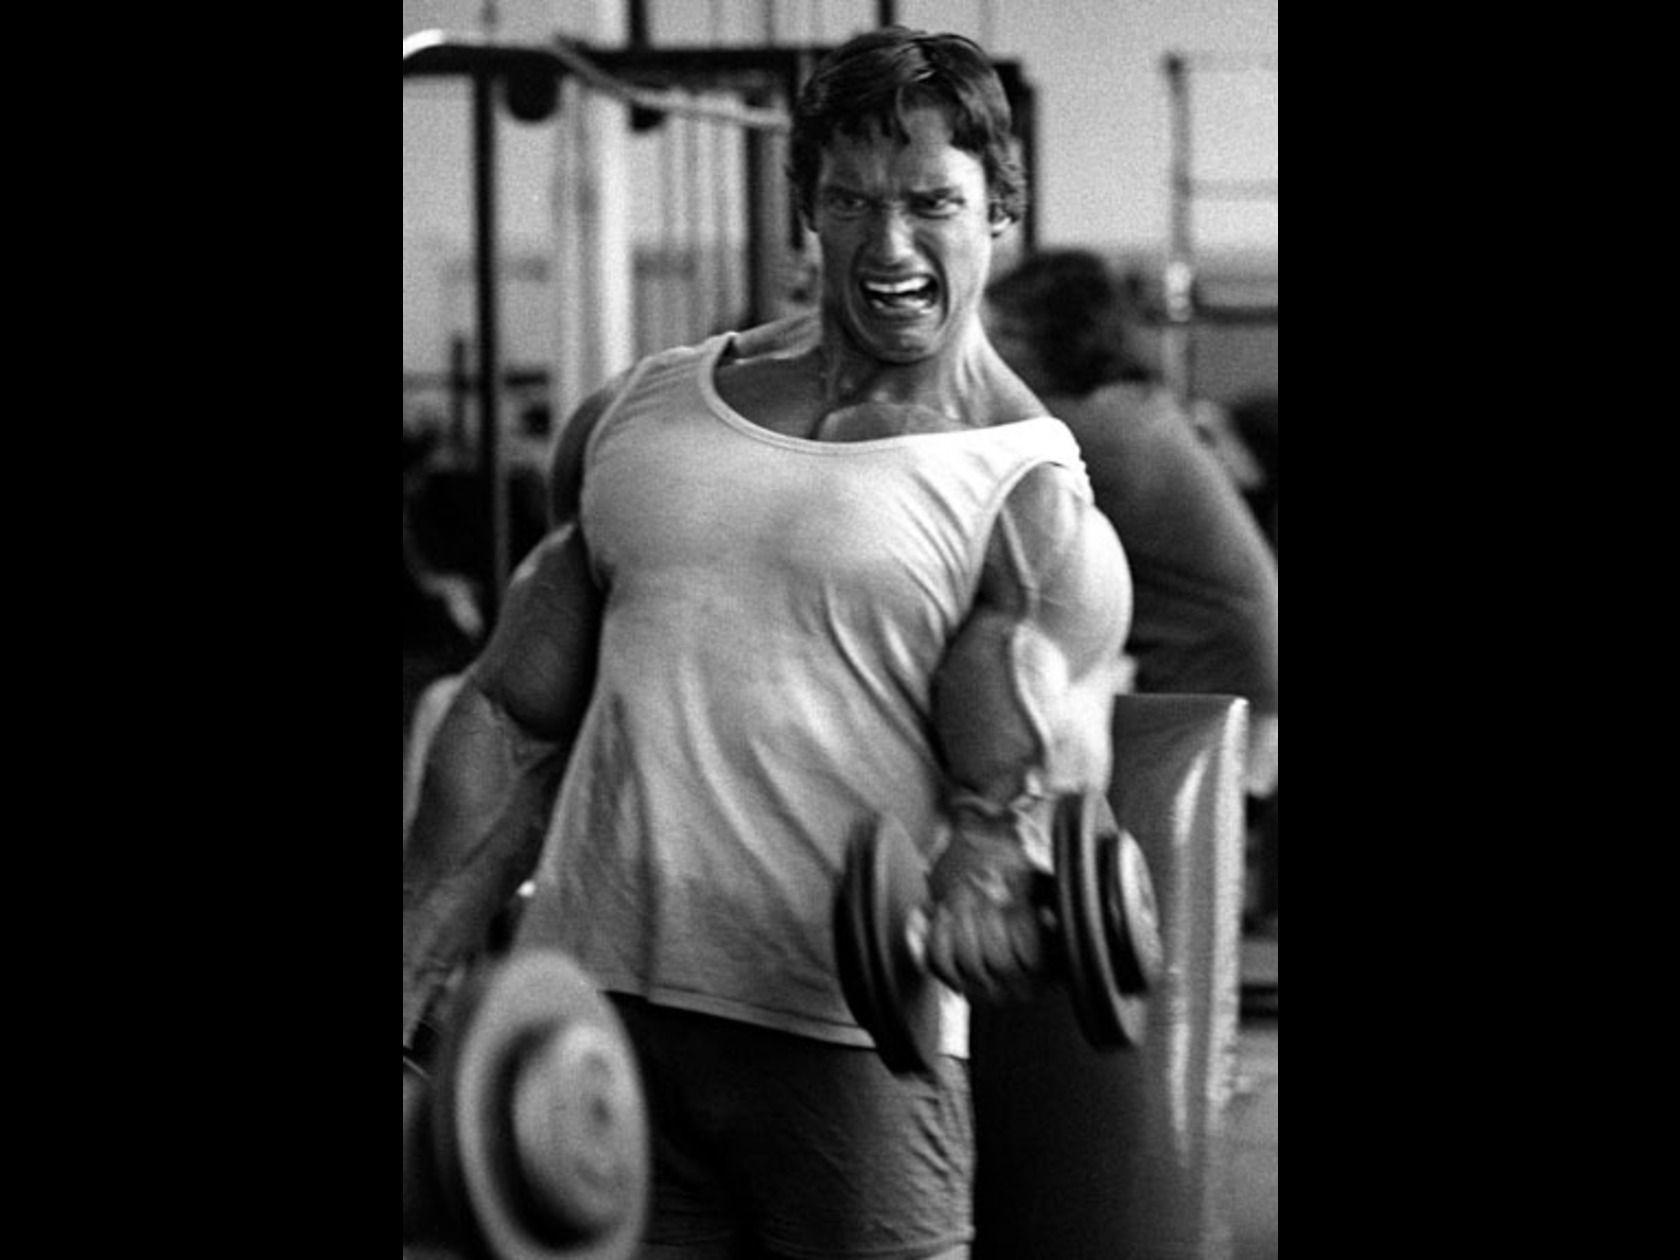 Arnold Schwarzenegger Bodybuilding Background 1 Hd Wallpapers